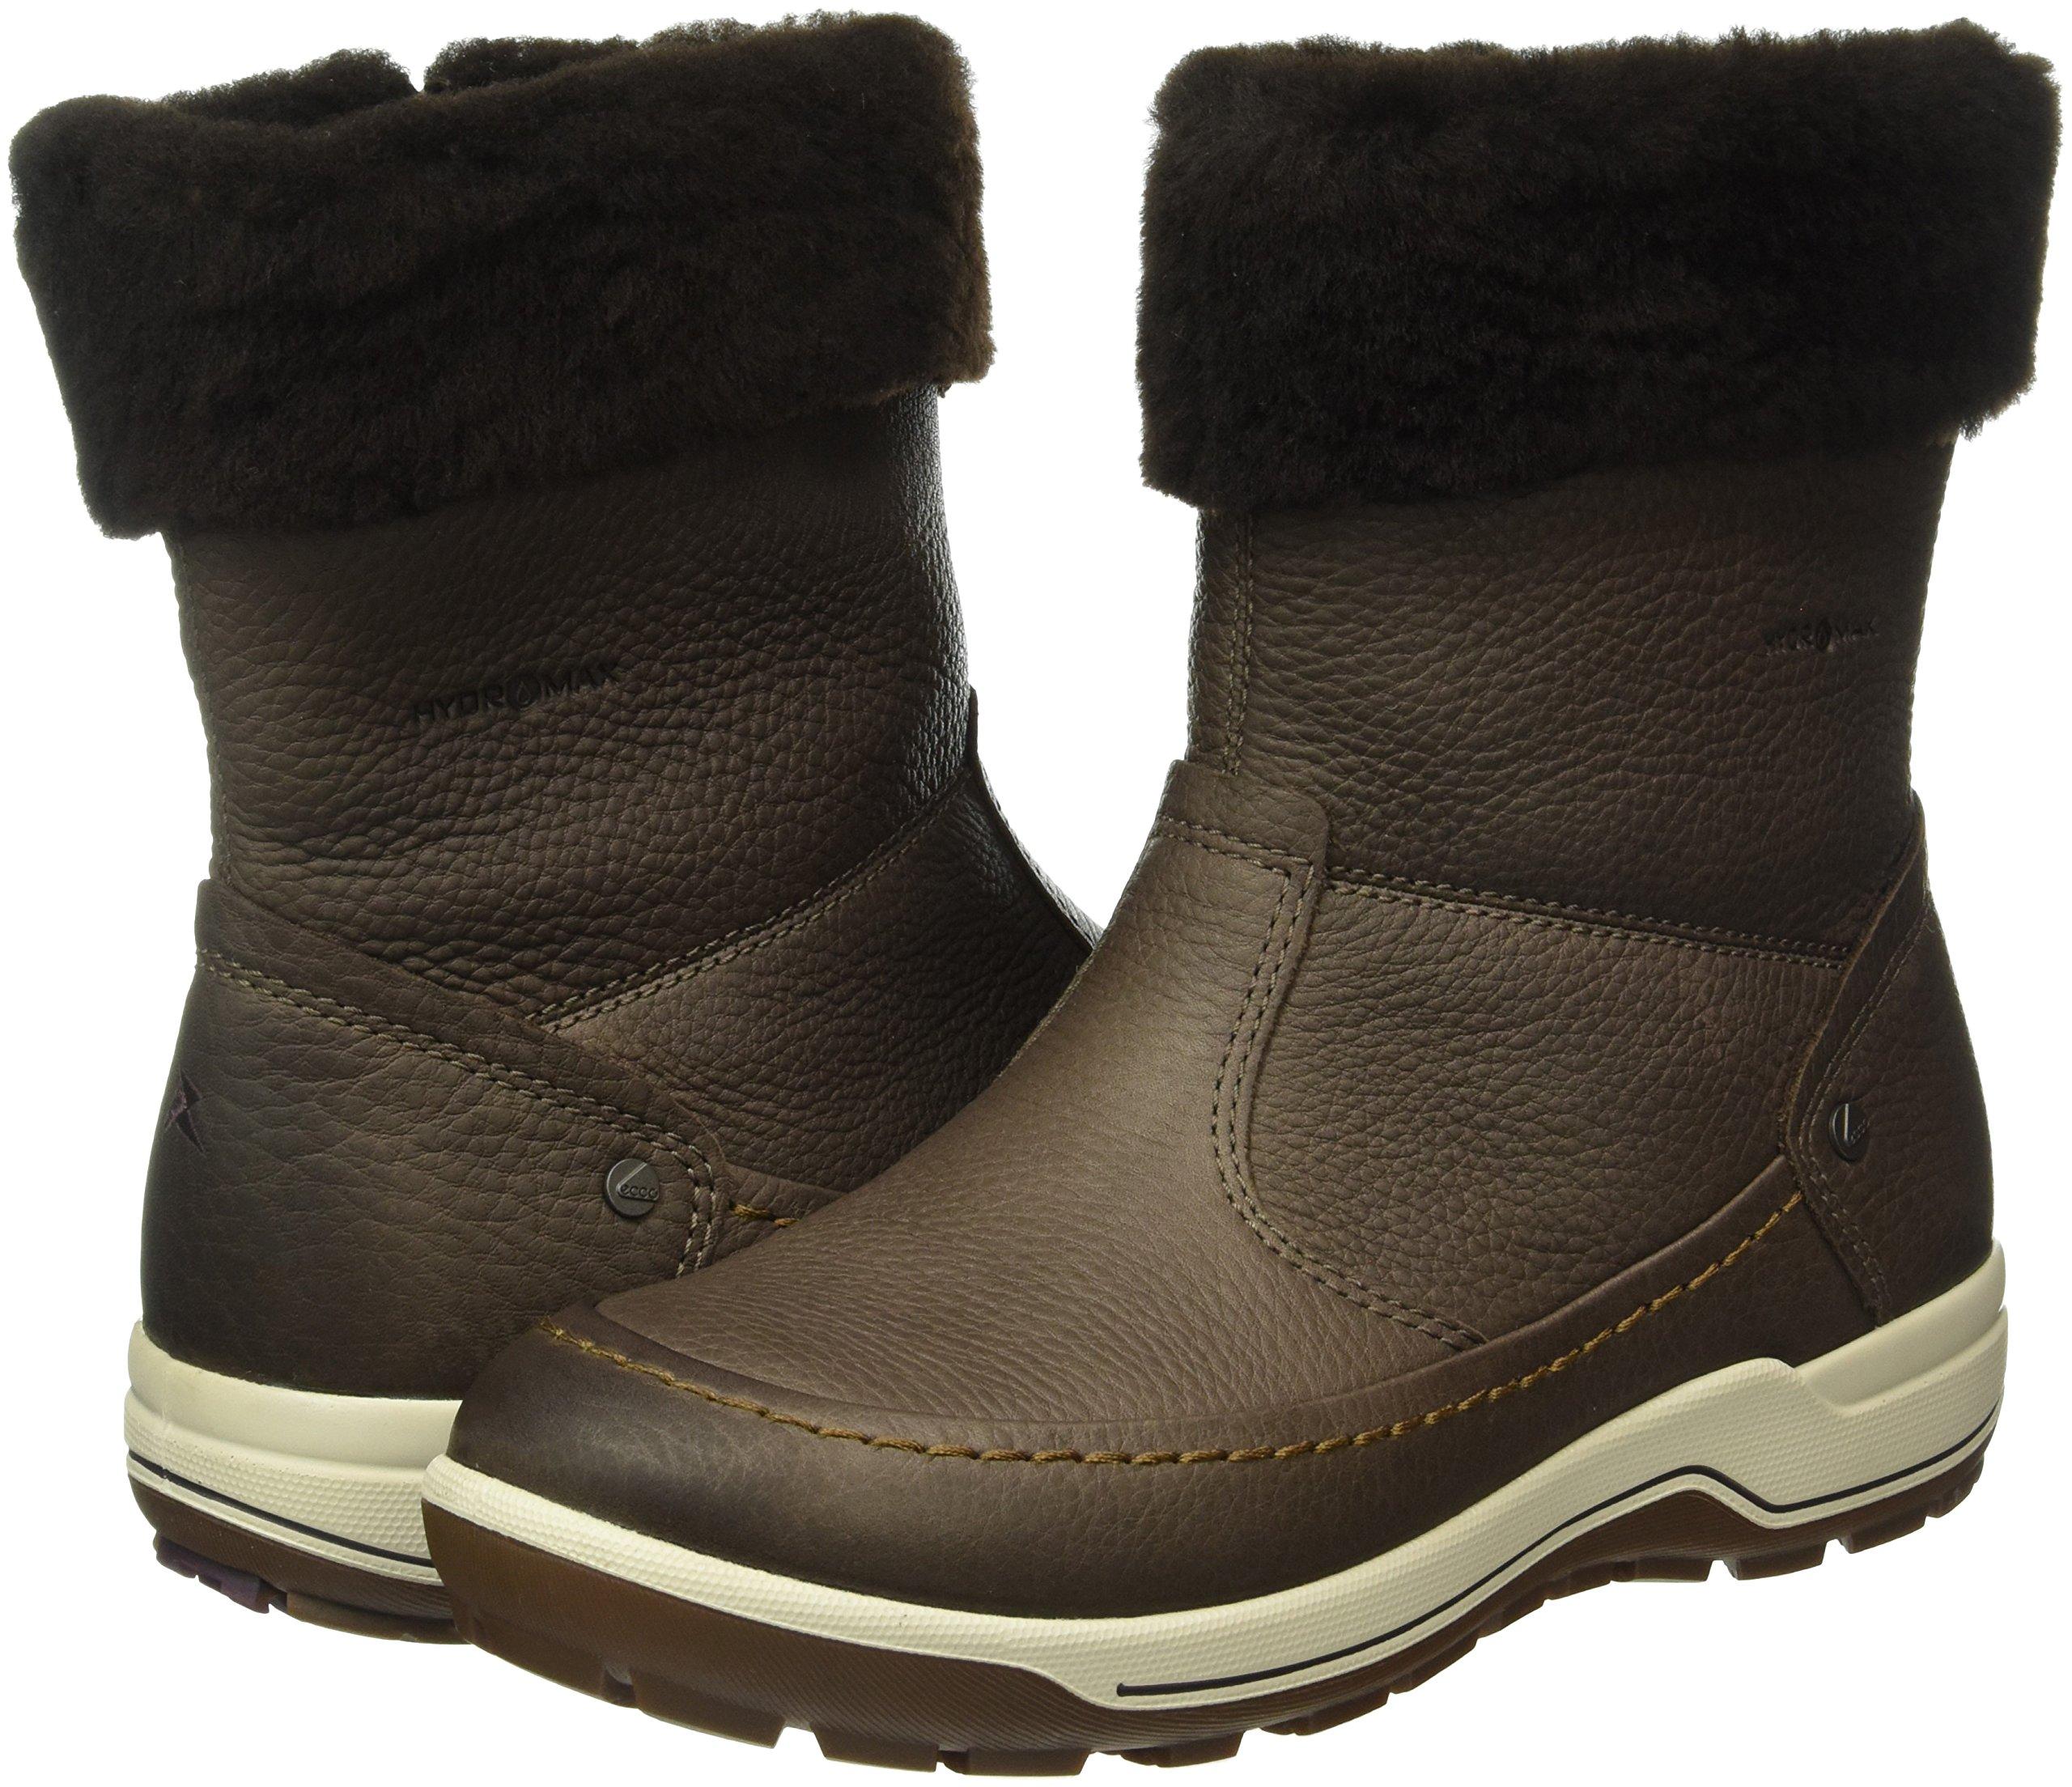 91rFlRg1Z0L - ECCO Women's Trace Boot-w Multisport Outdoor Shoes